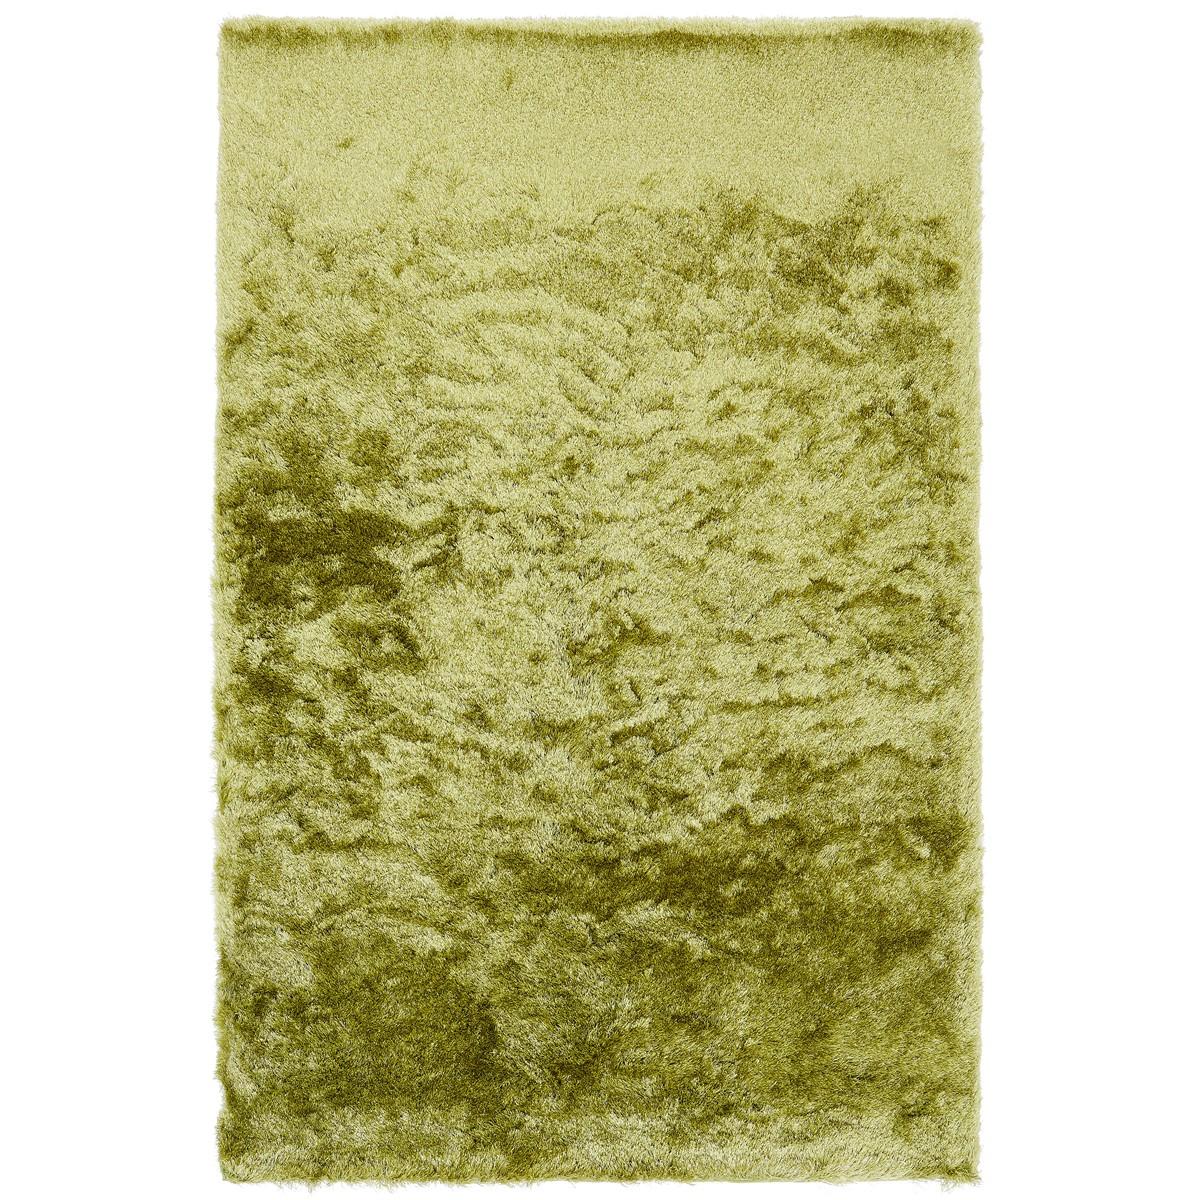 Tapis shaggy doux en Polyester Vert clair 120x180 cm